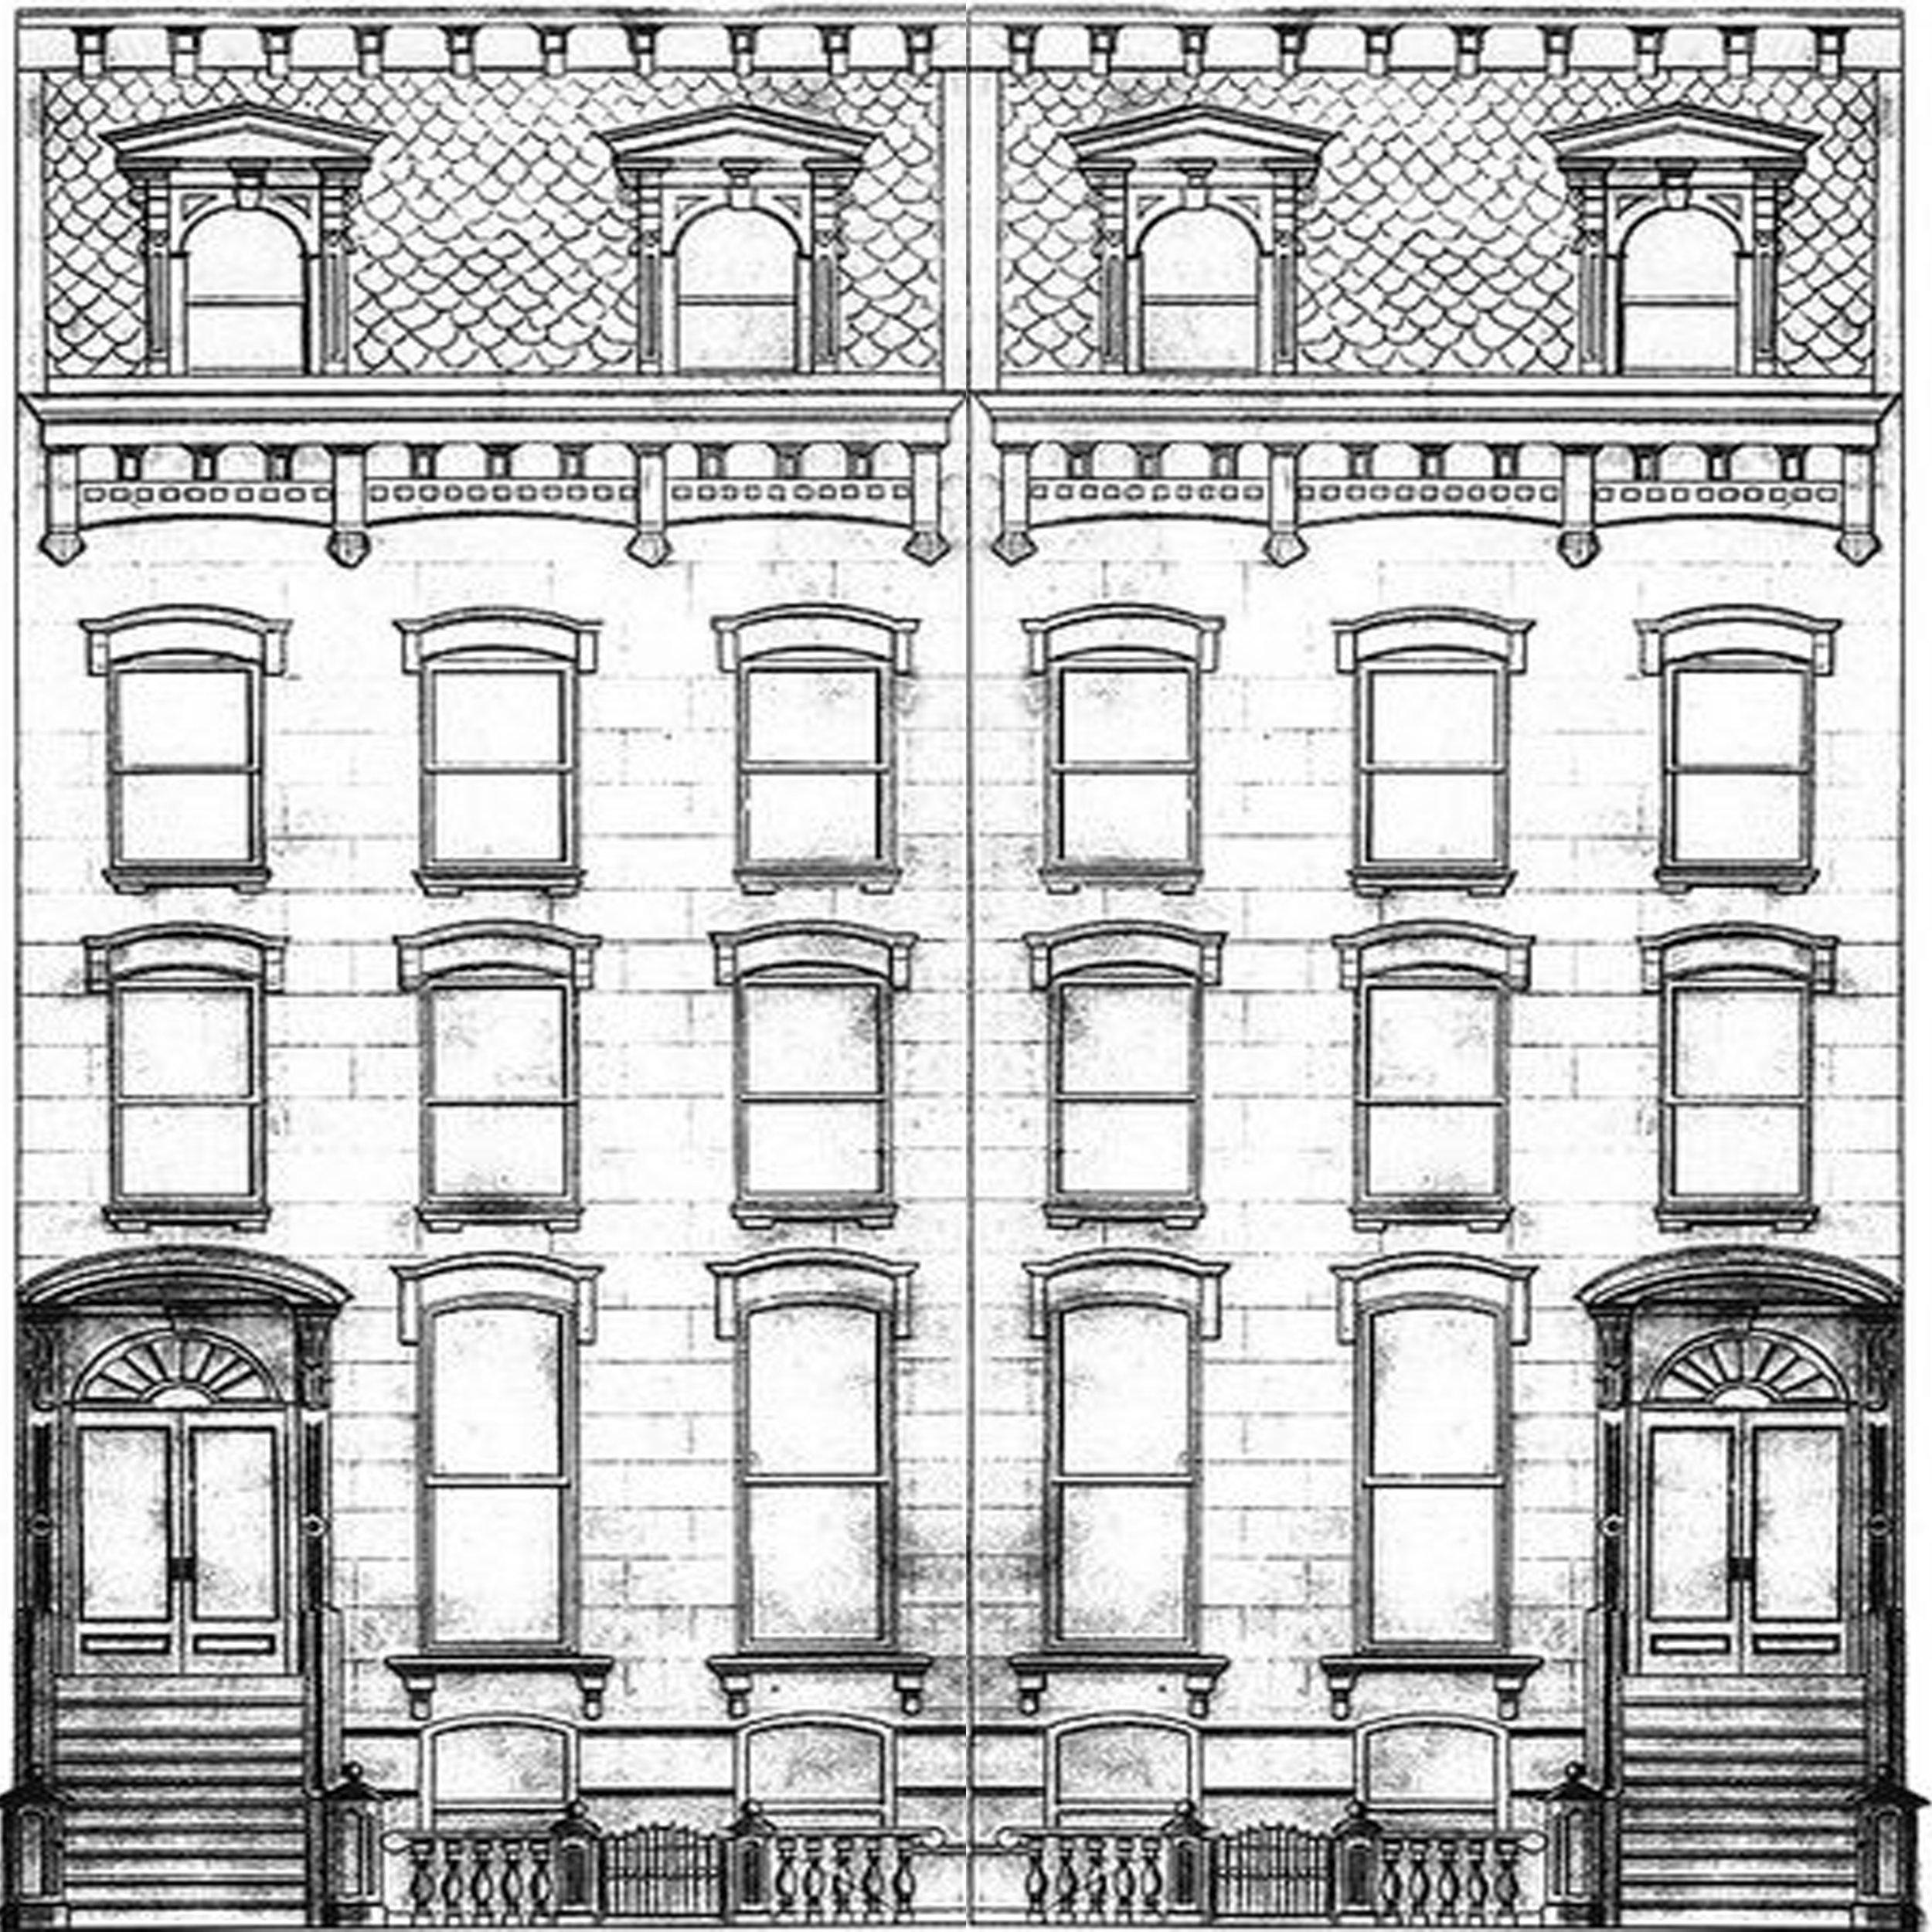 Copy of Bainbridge Street